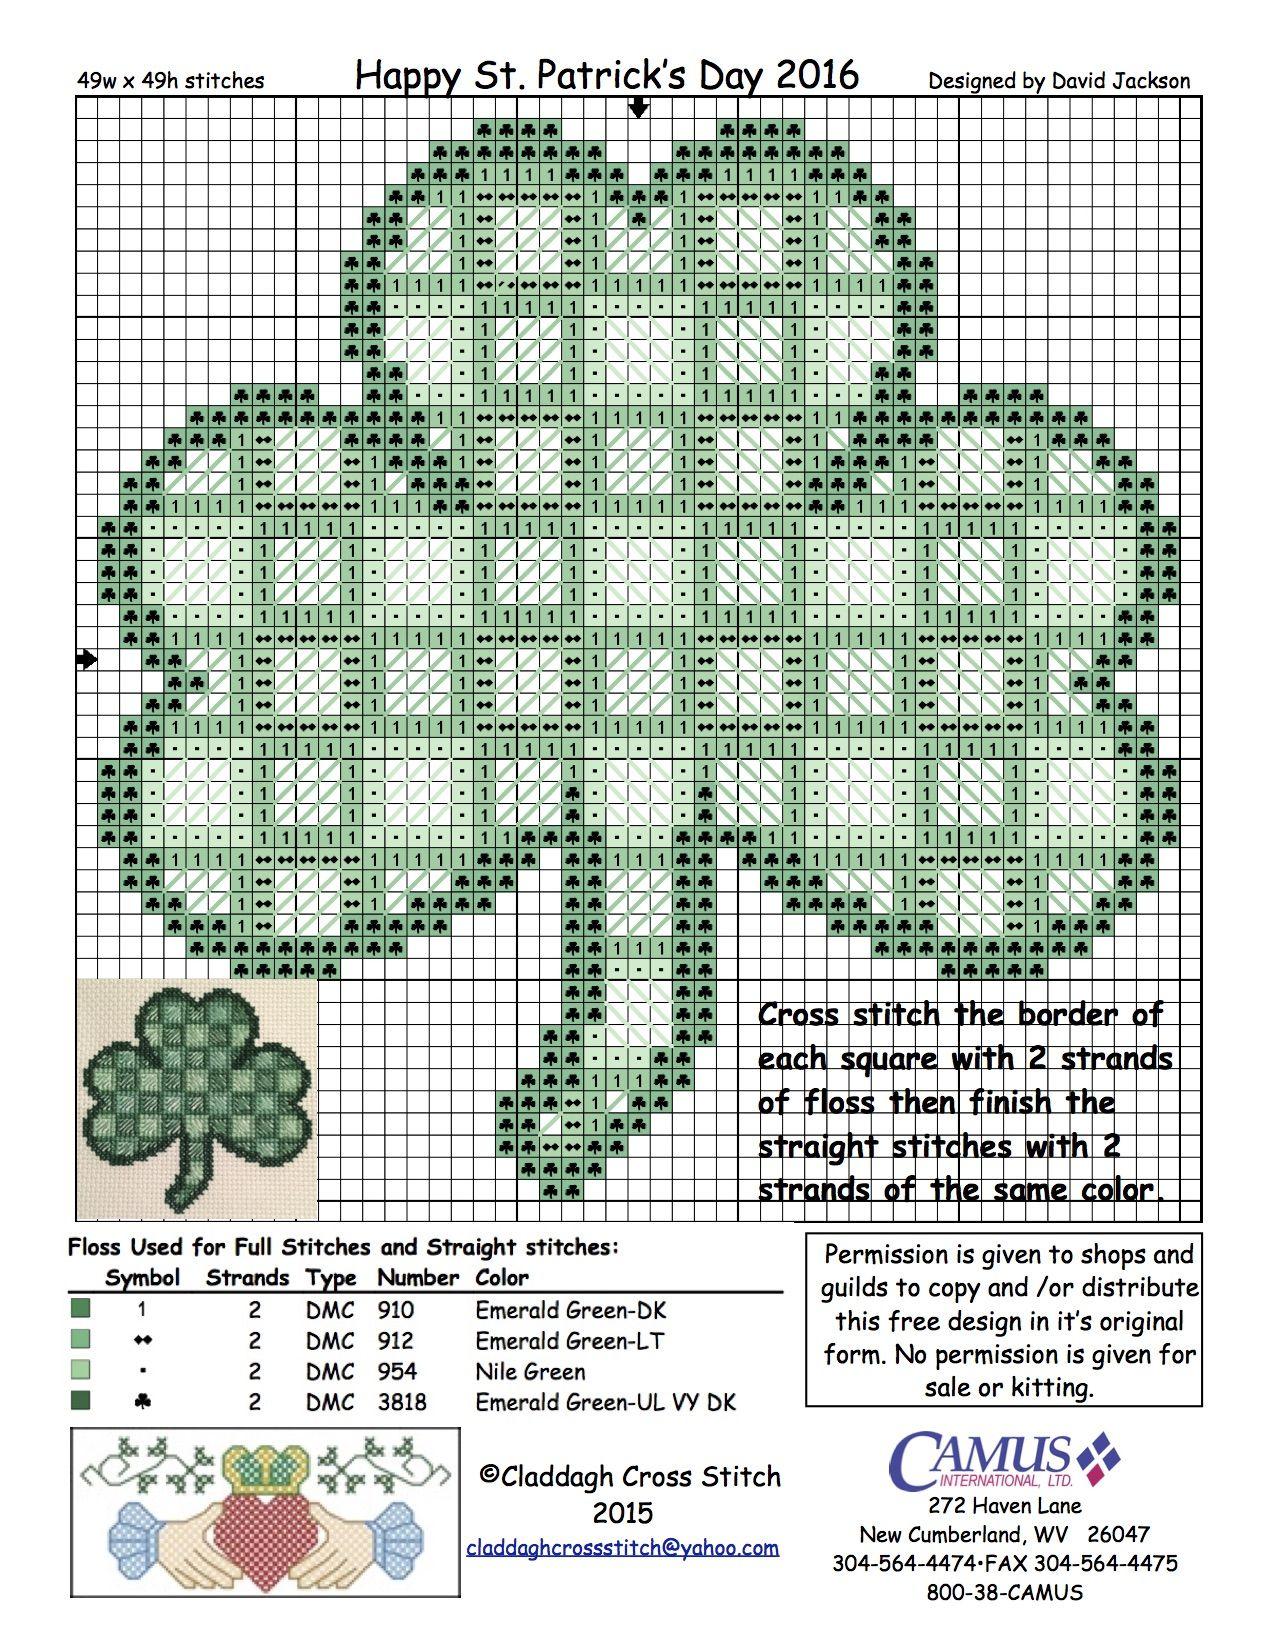 Celtic Shamrock by Claddagh Cross Stitch via Camus International ...